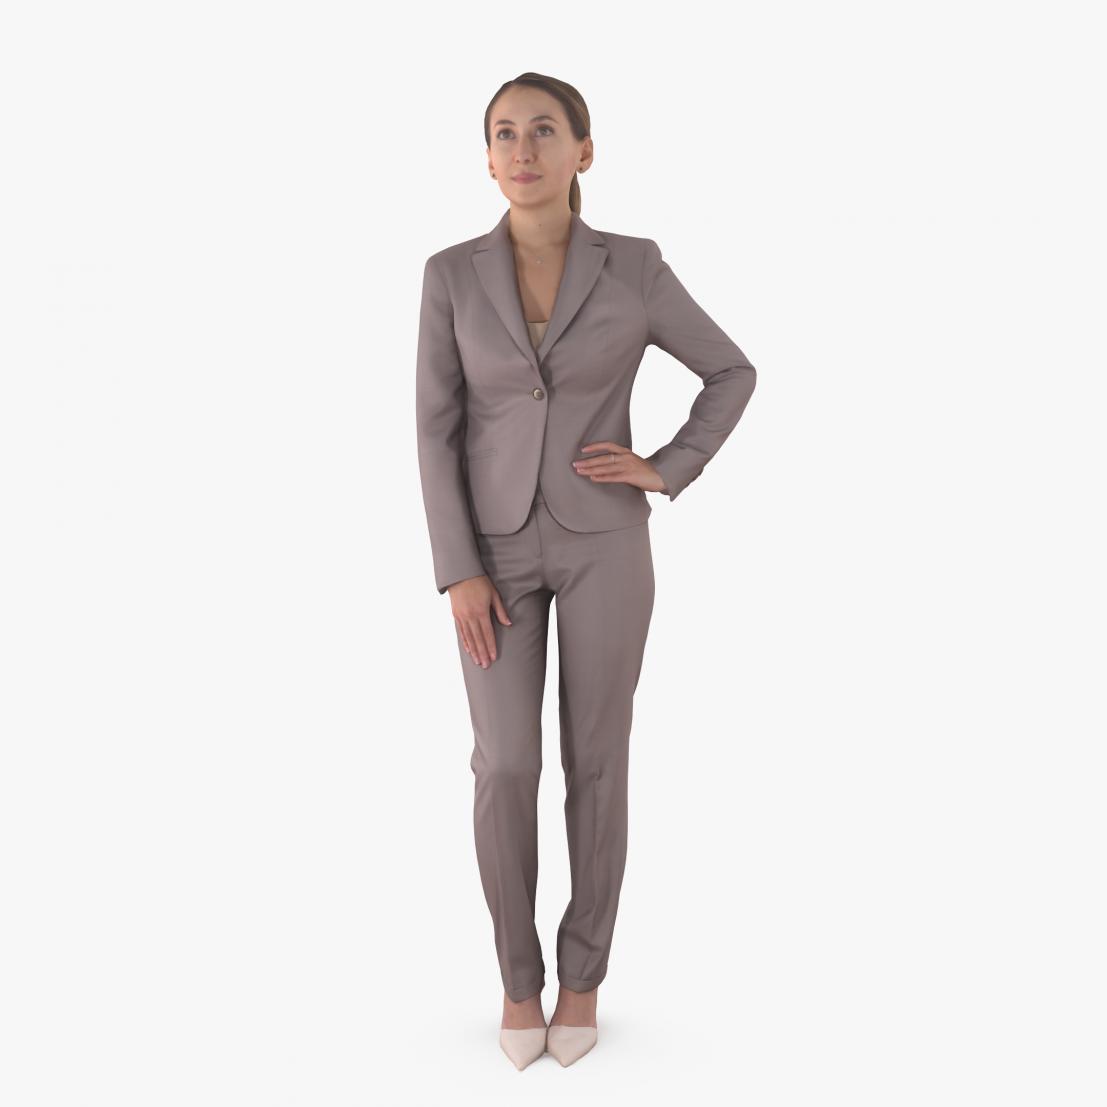 Business Woman Posing 3D Model | 3DTree Scanning Studio